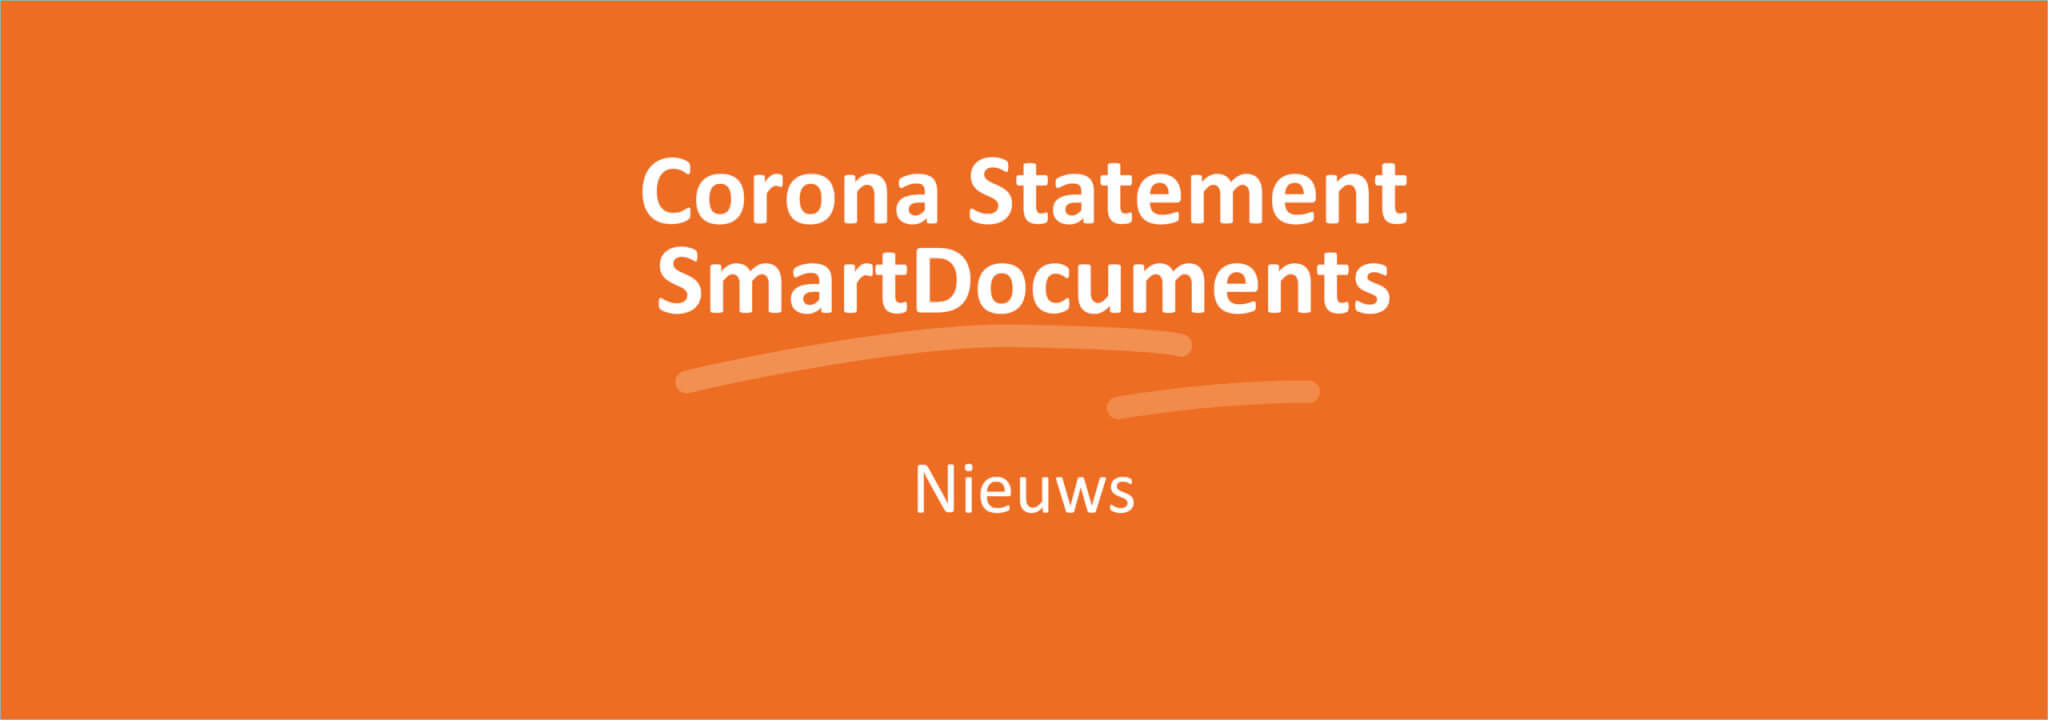 Corona statement SmartDocuments